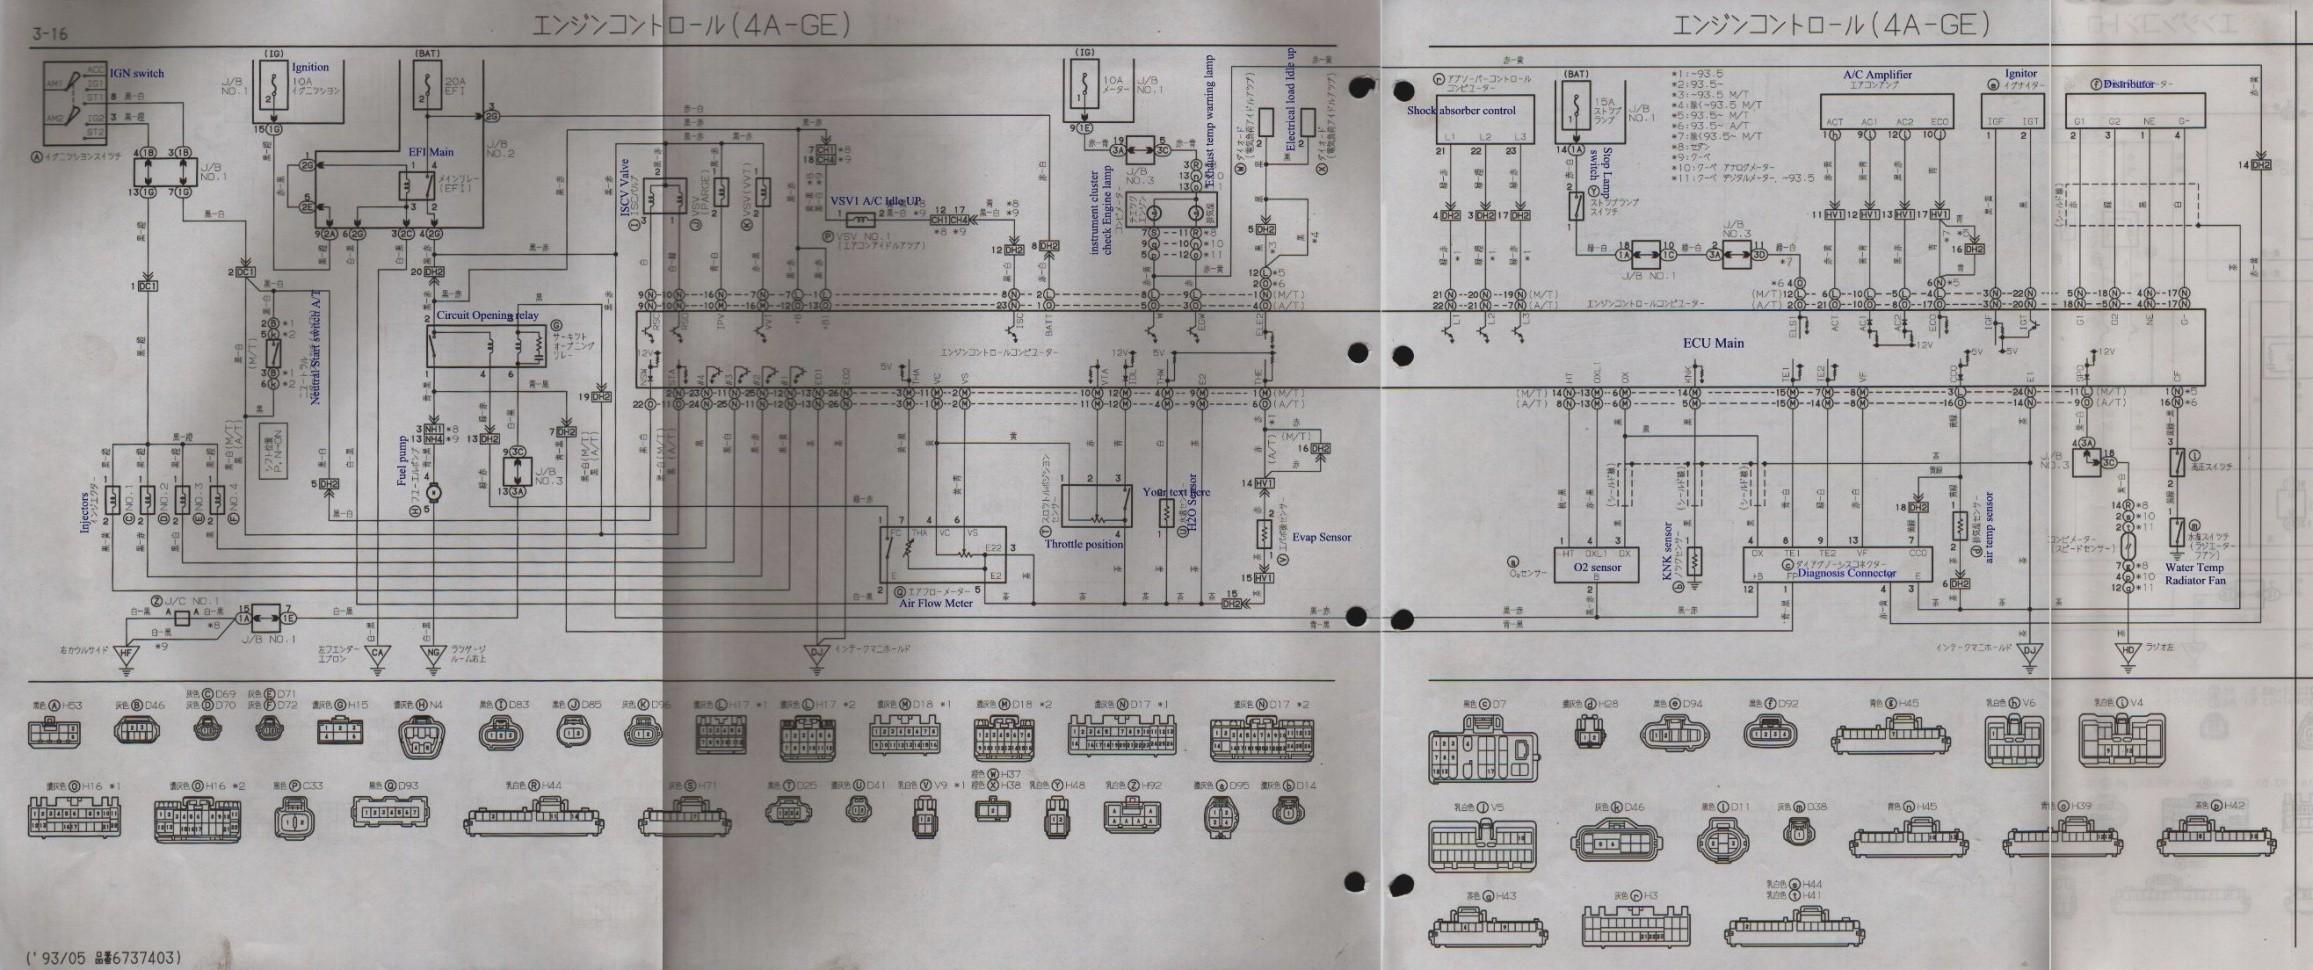 Toyota Corolla Ae111 Manual Wiring Diagram - Today Manual Guide ...